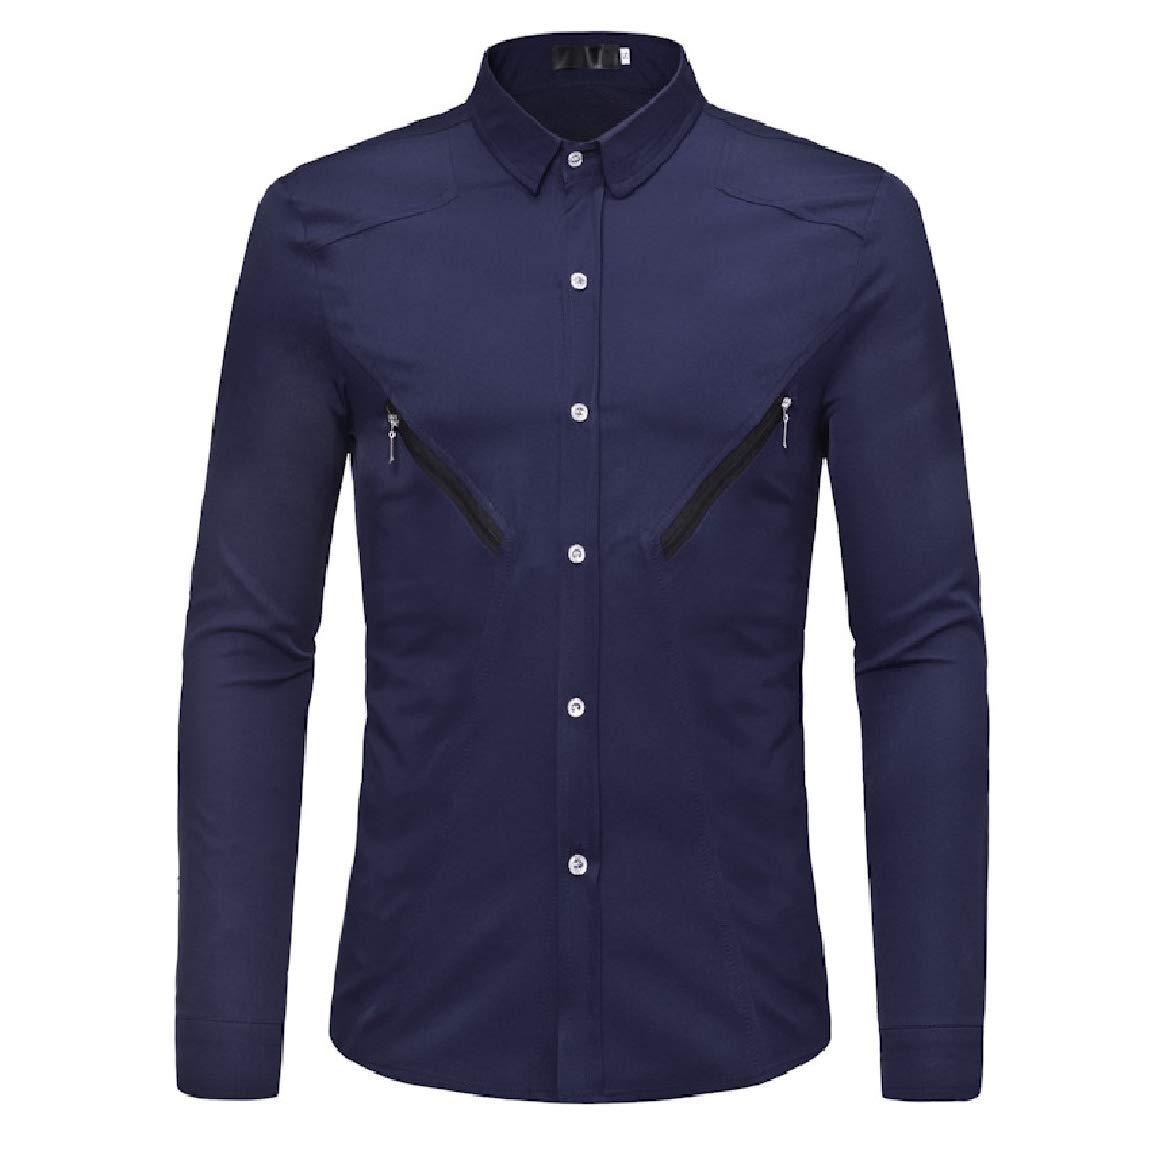 Mirrliy Mens Solid Trim-Fit Turn Down Collar Zipper Long-Sleeve Western Shirt